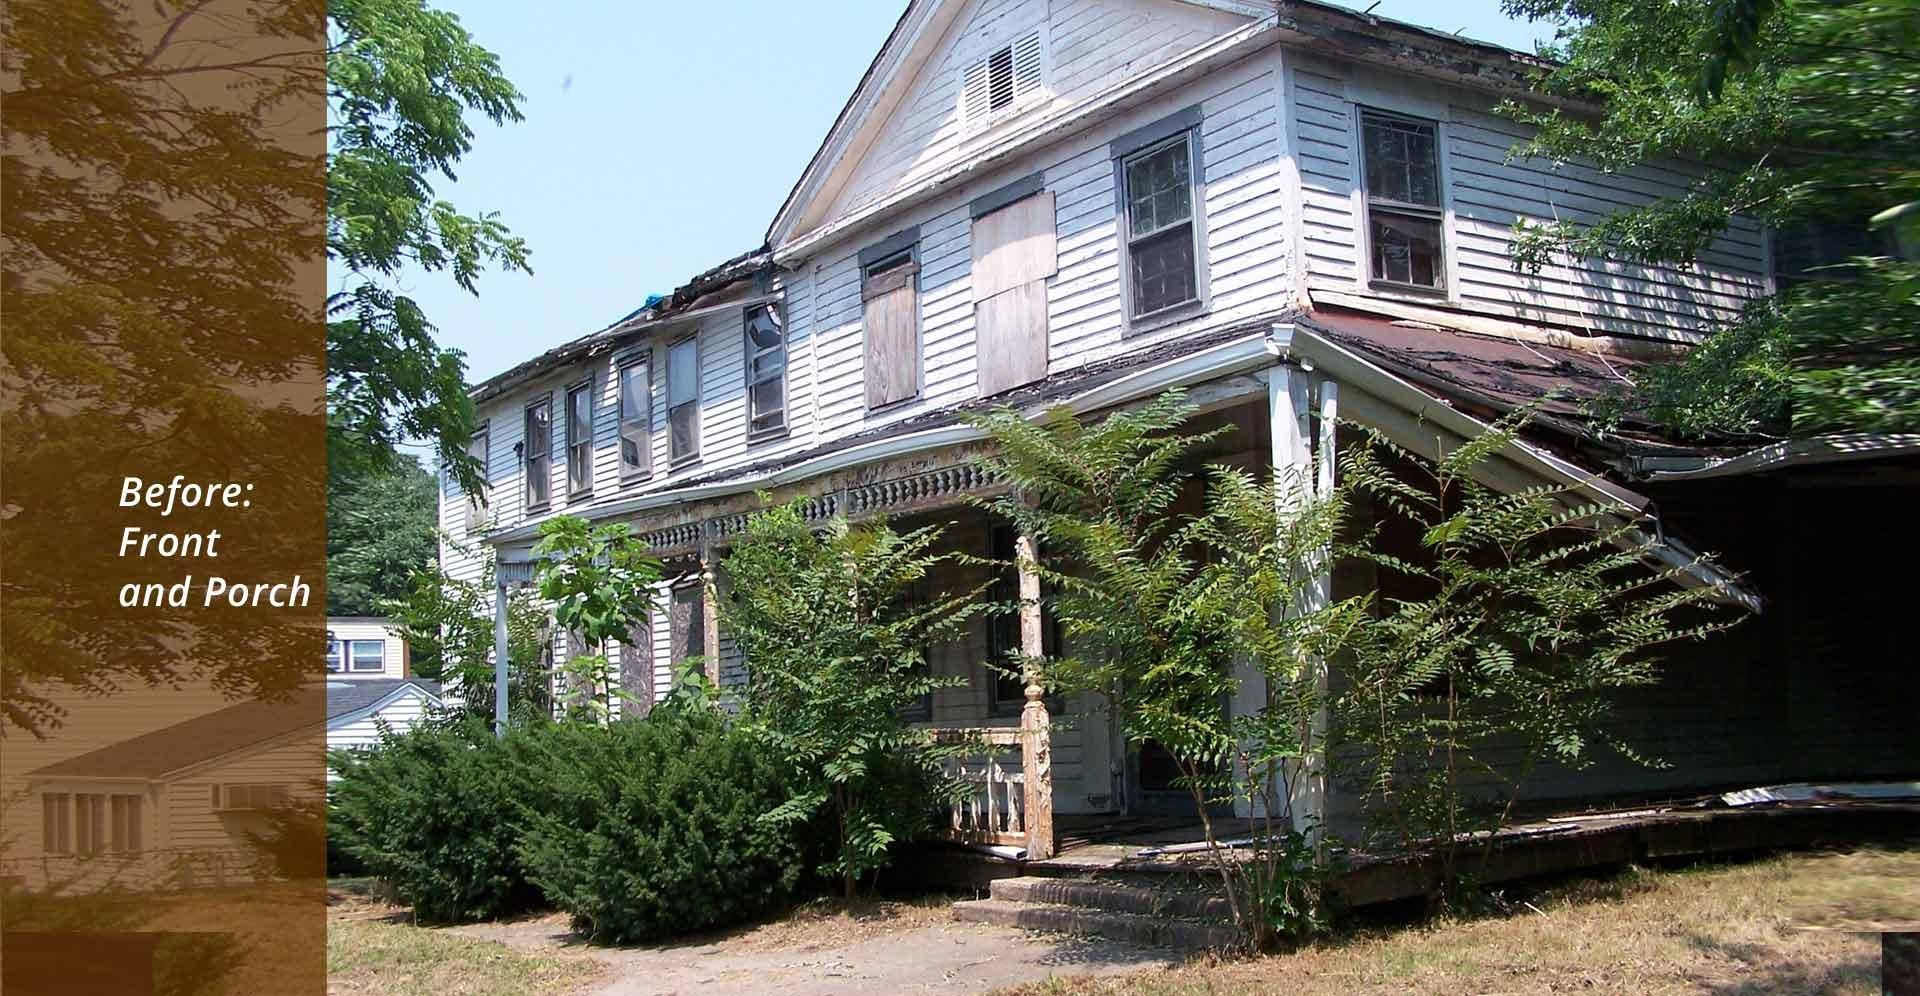 HOTCHKISS-HOUSE-FACADE-AND-PORCH-BEFORE.jpg